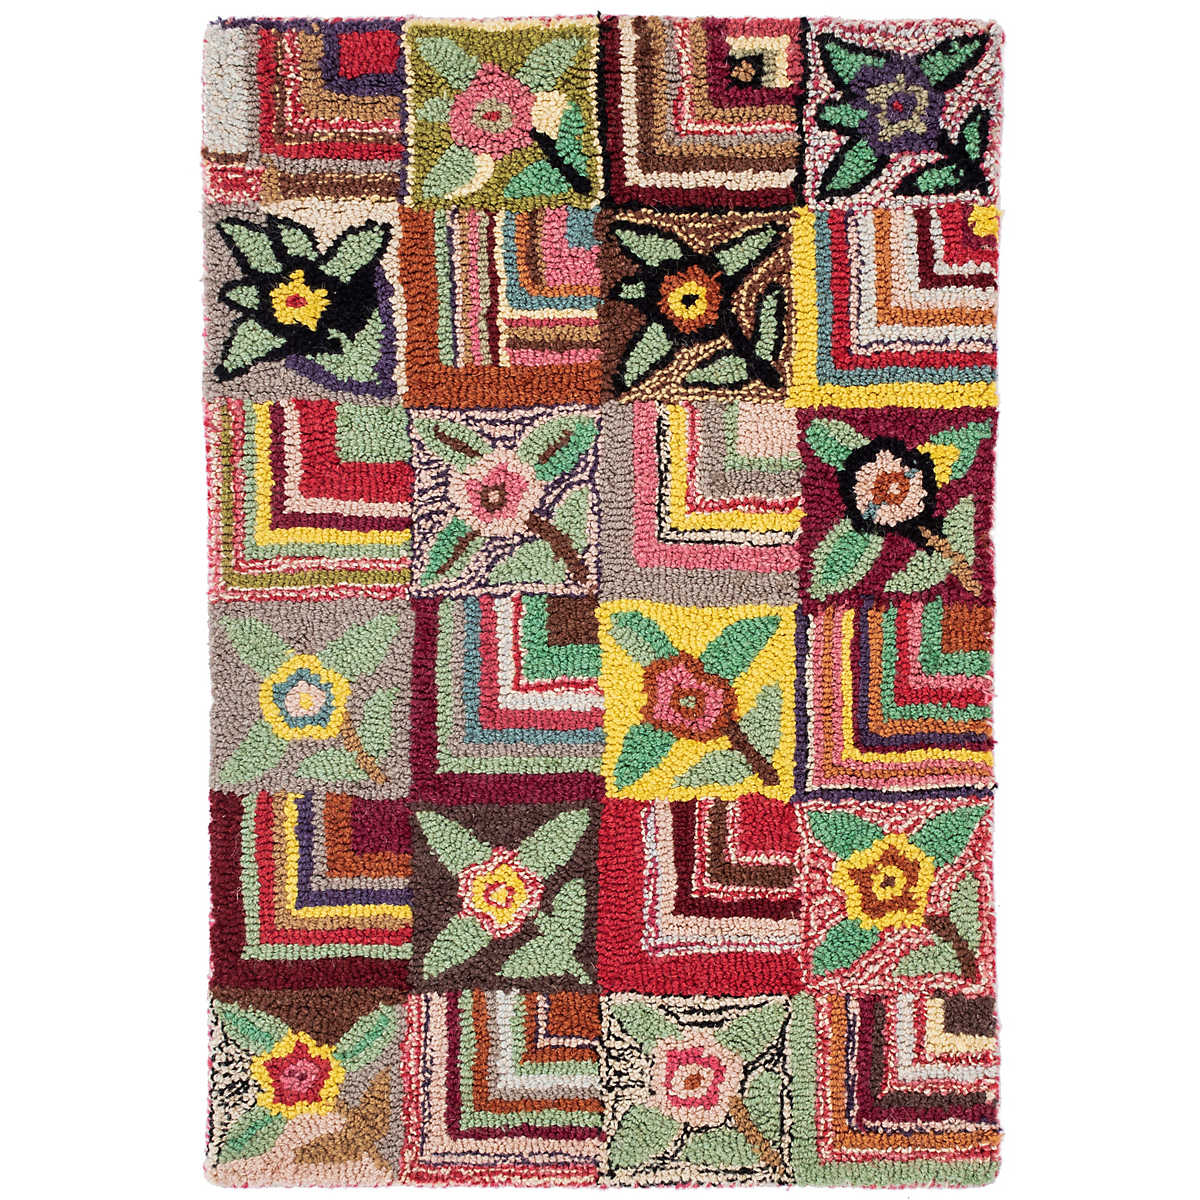 Gypsy rose wool hooked rug dash albert for Dash and albert blankets